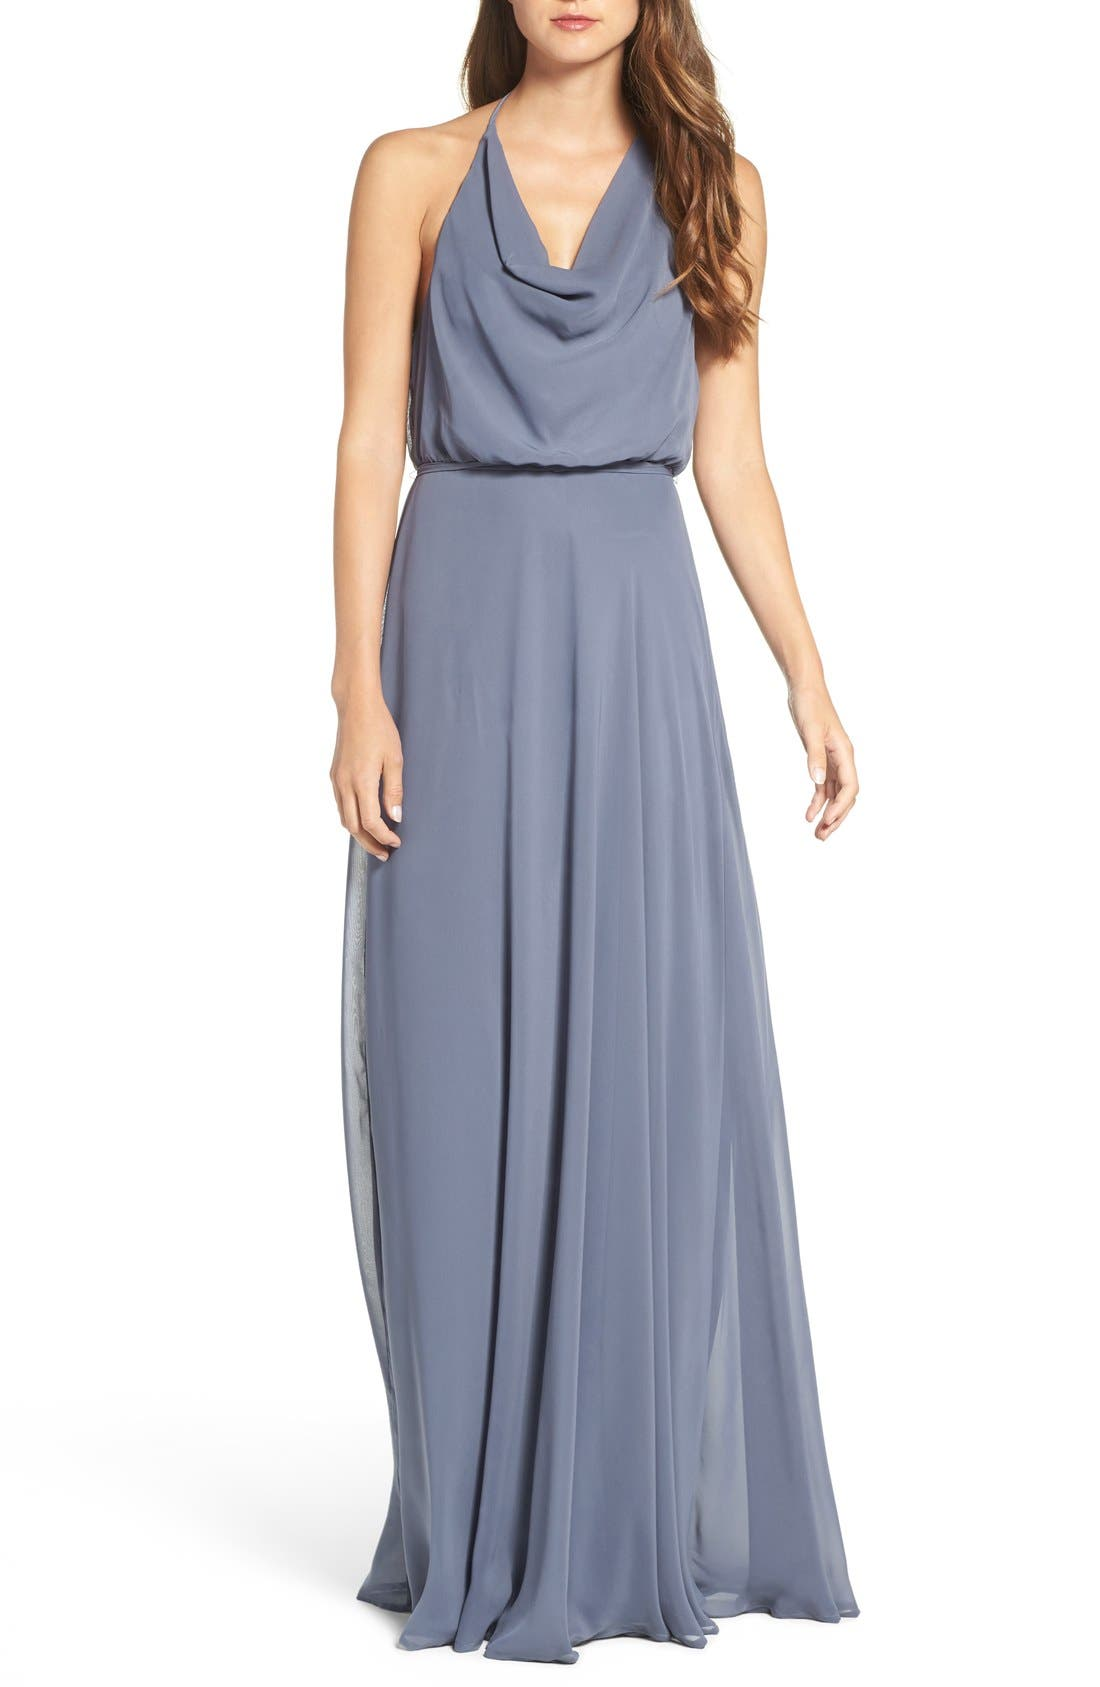 Alternate Image 1 Selected - nouvelle AMSALE 'Alyssa' Cowl Neck Chiffon Halter Gown